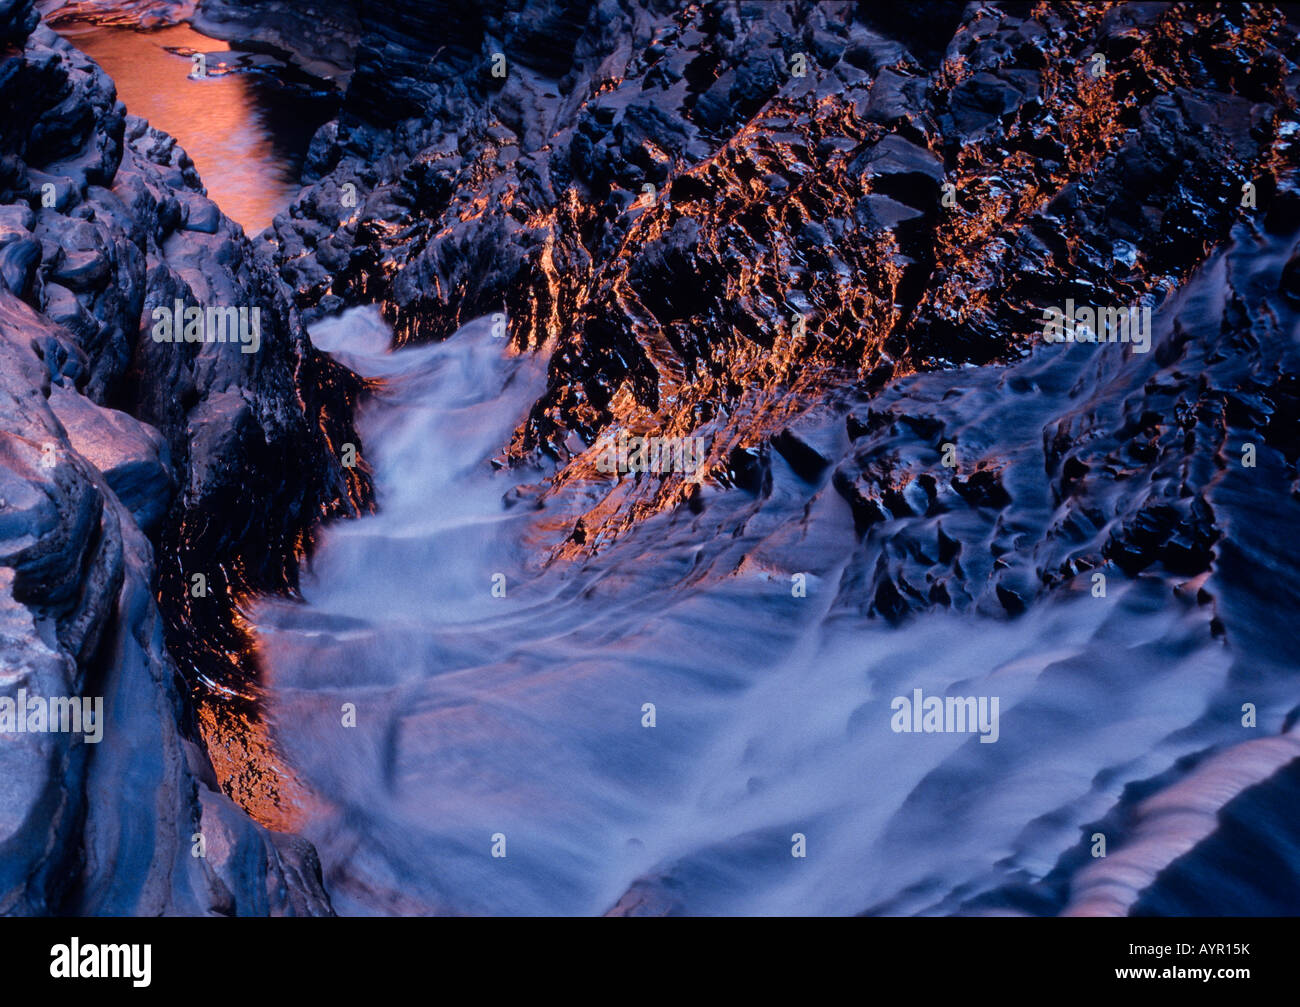 Fast-flowing stream (torrent), Hancock Gorge, Karijini National Park, Pilbara Region, Western Australia, Australia - Stock Image